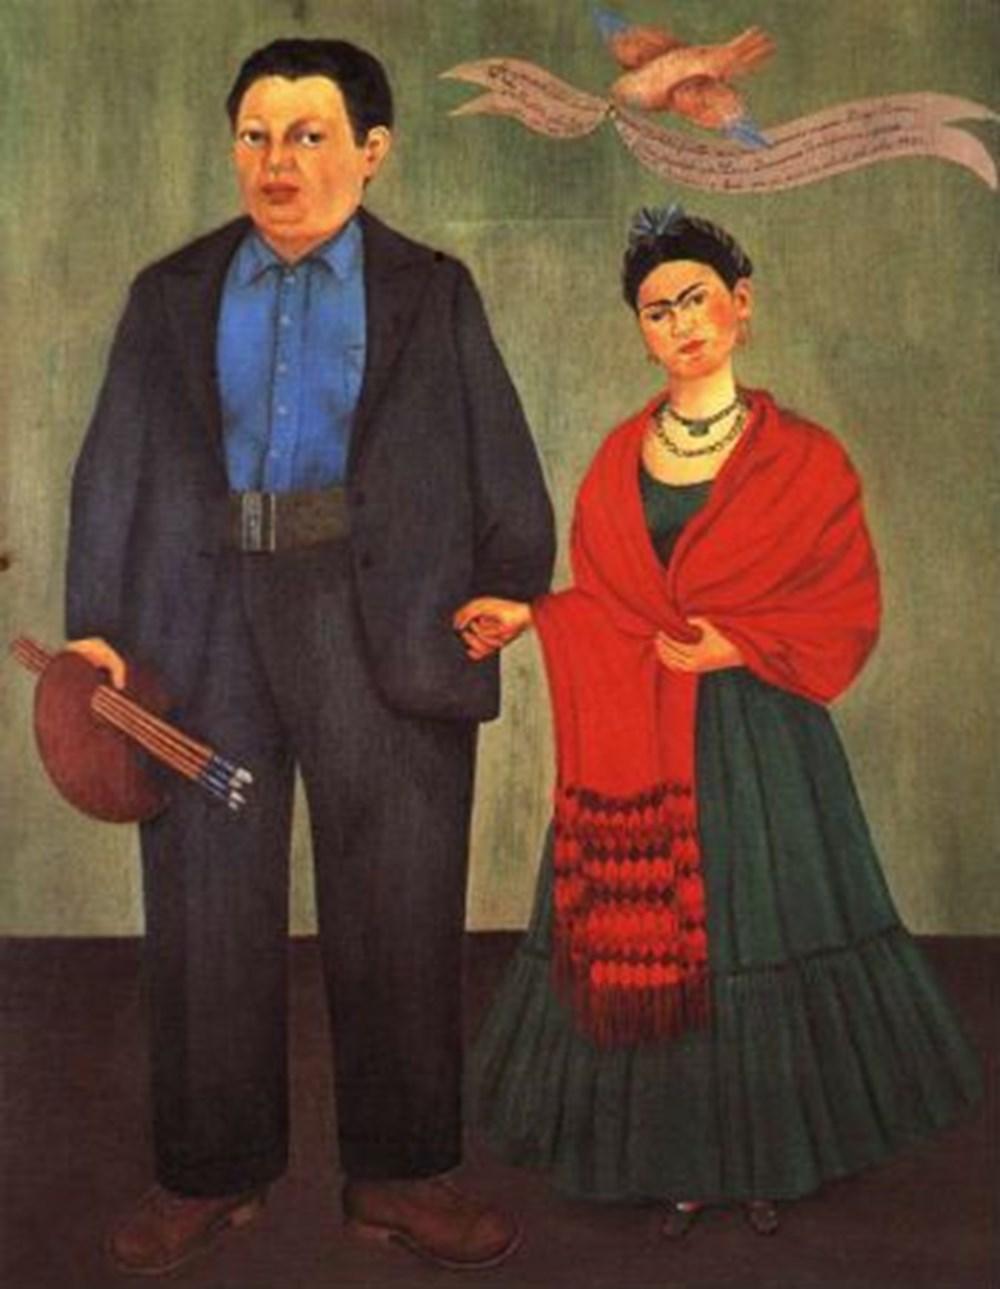 Frida Kahlo kimdir? (Tahta Bacak Frida Kahlo'nun hayatı) - 9